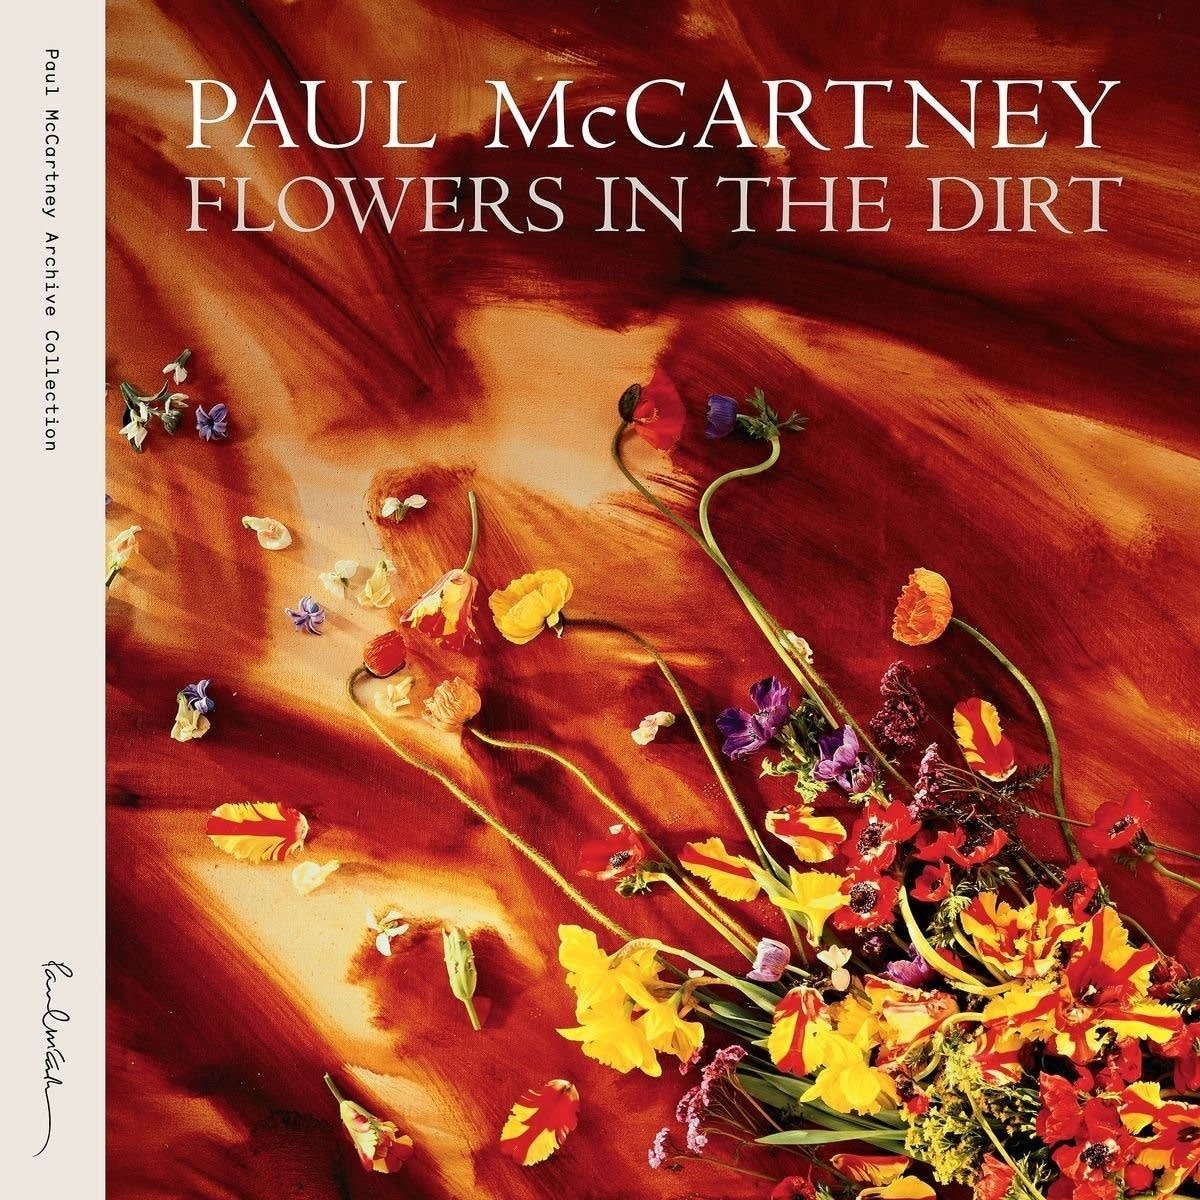 Paul McCartney, 'Flowers in the Dirt'